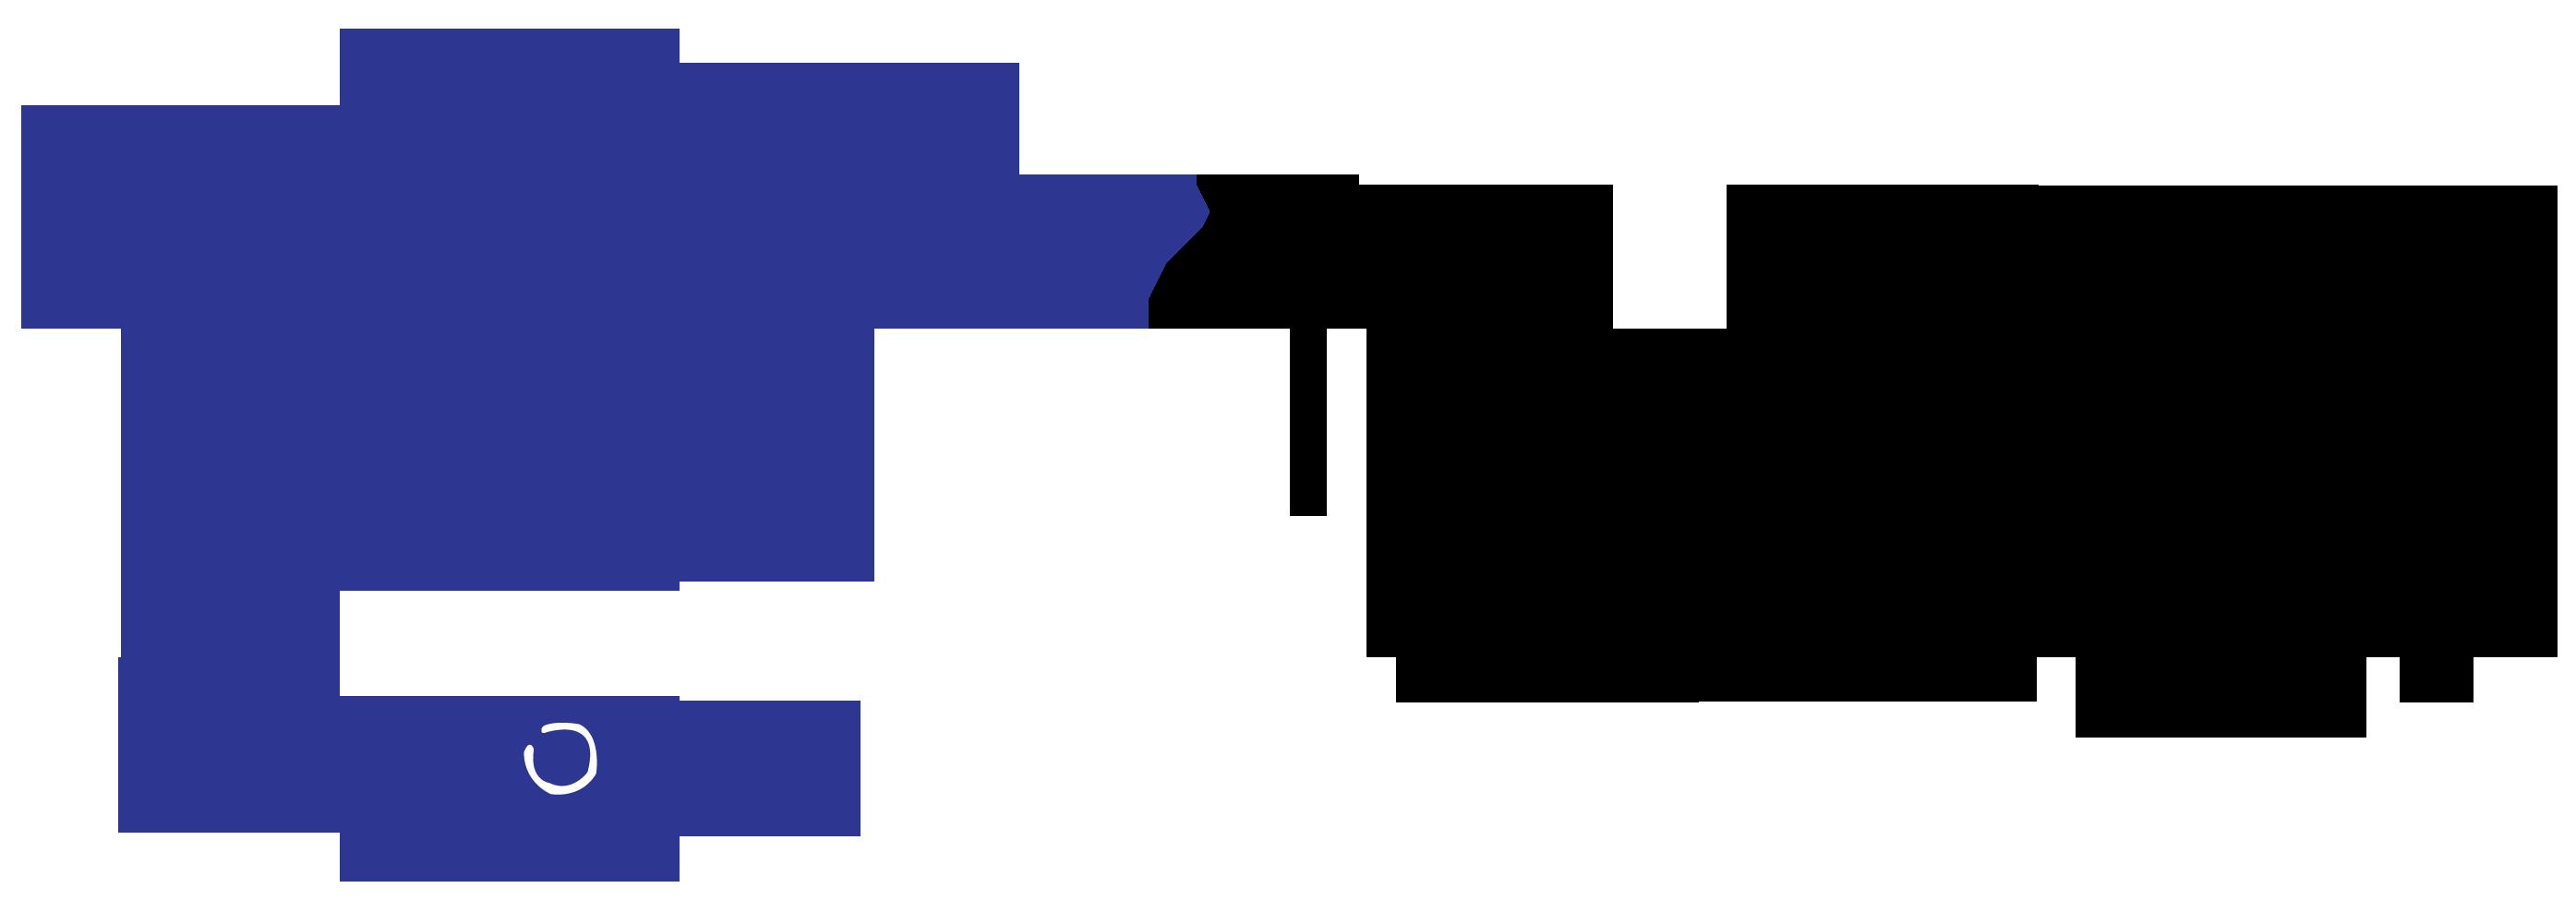 博士屯logo